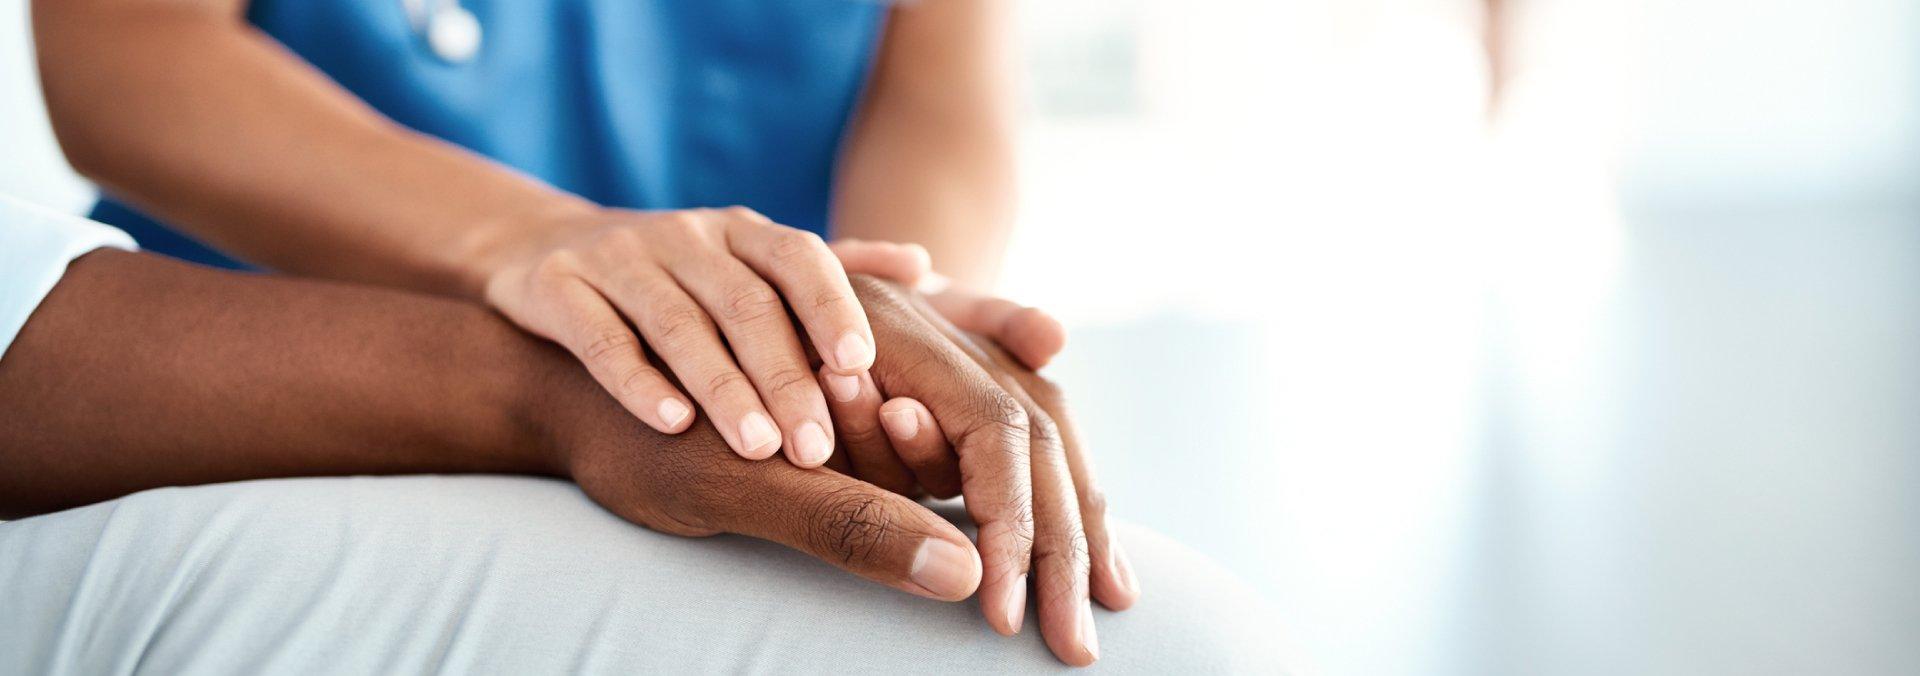 Woman Comforting Patient